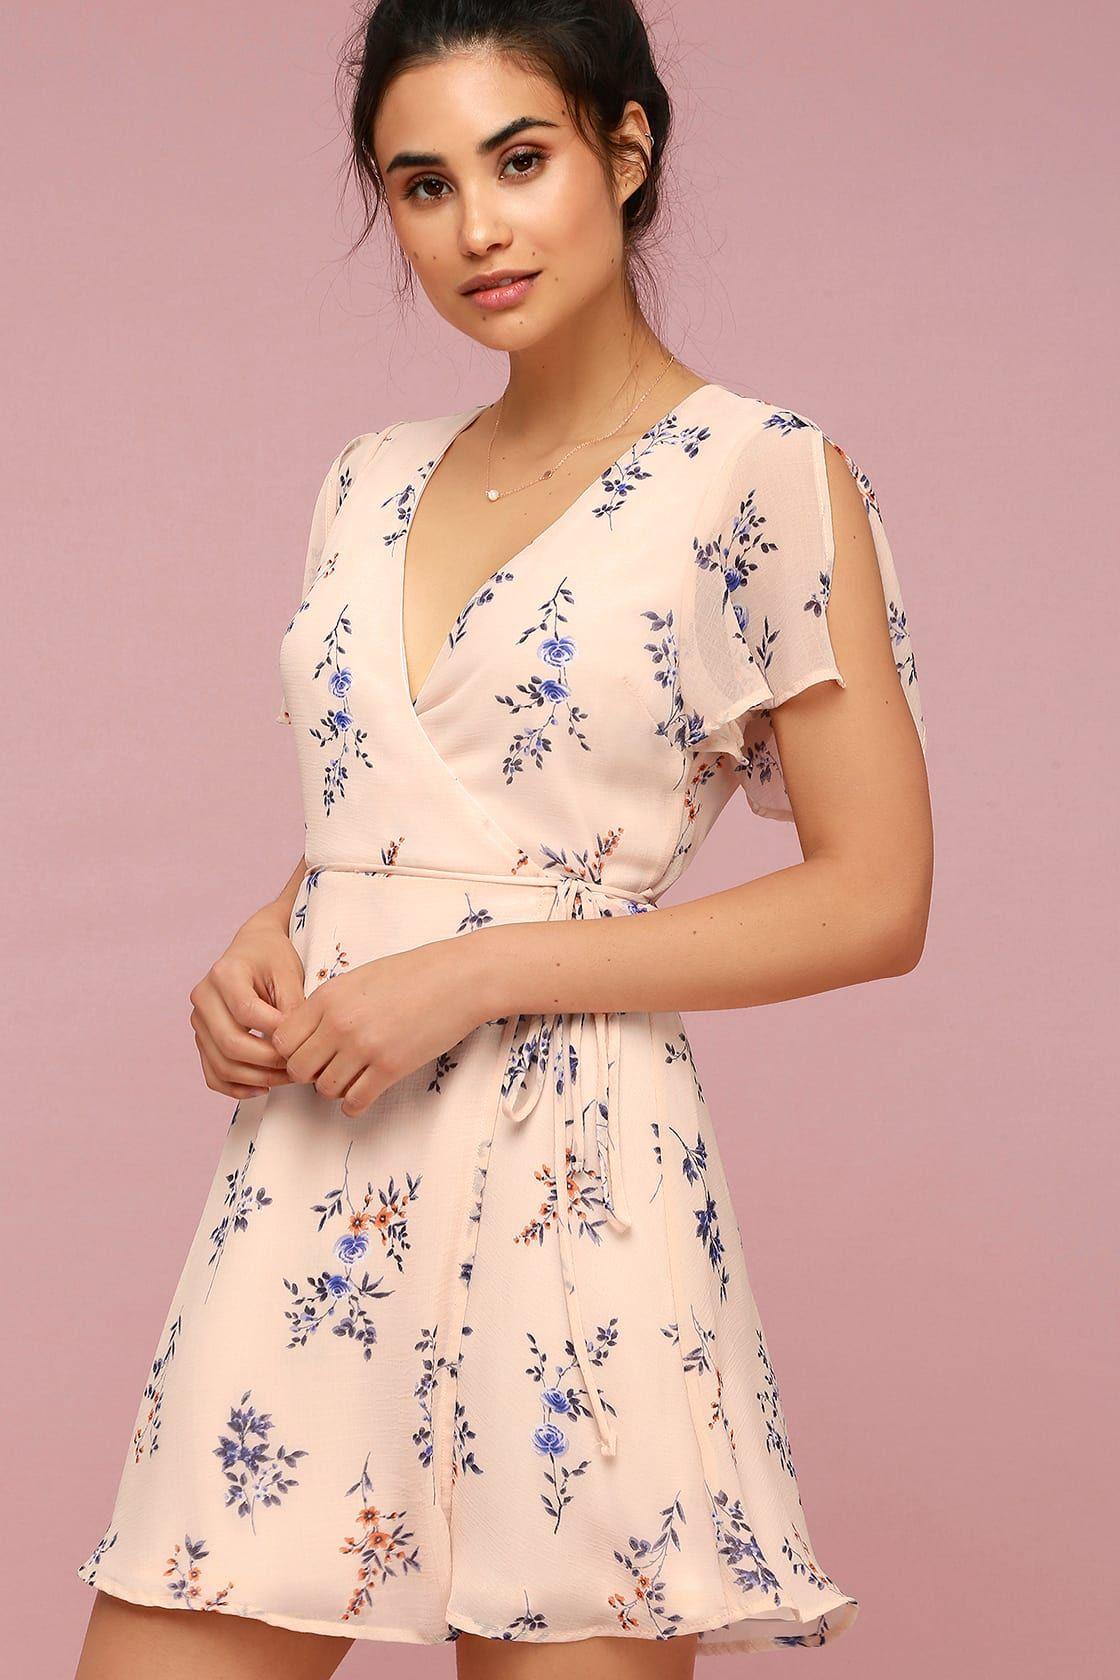 Fowler Blush Pink Floral Print Wrap Dress In 2020 Printed Wrap Dresses Short Dresses Casual Dresses